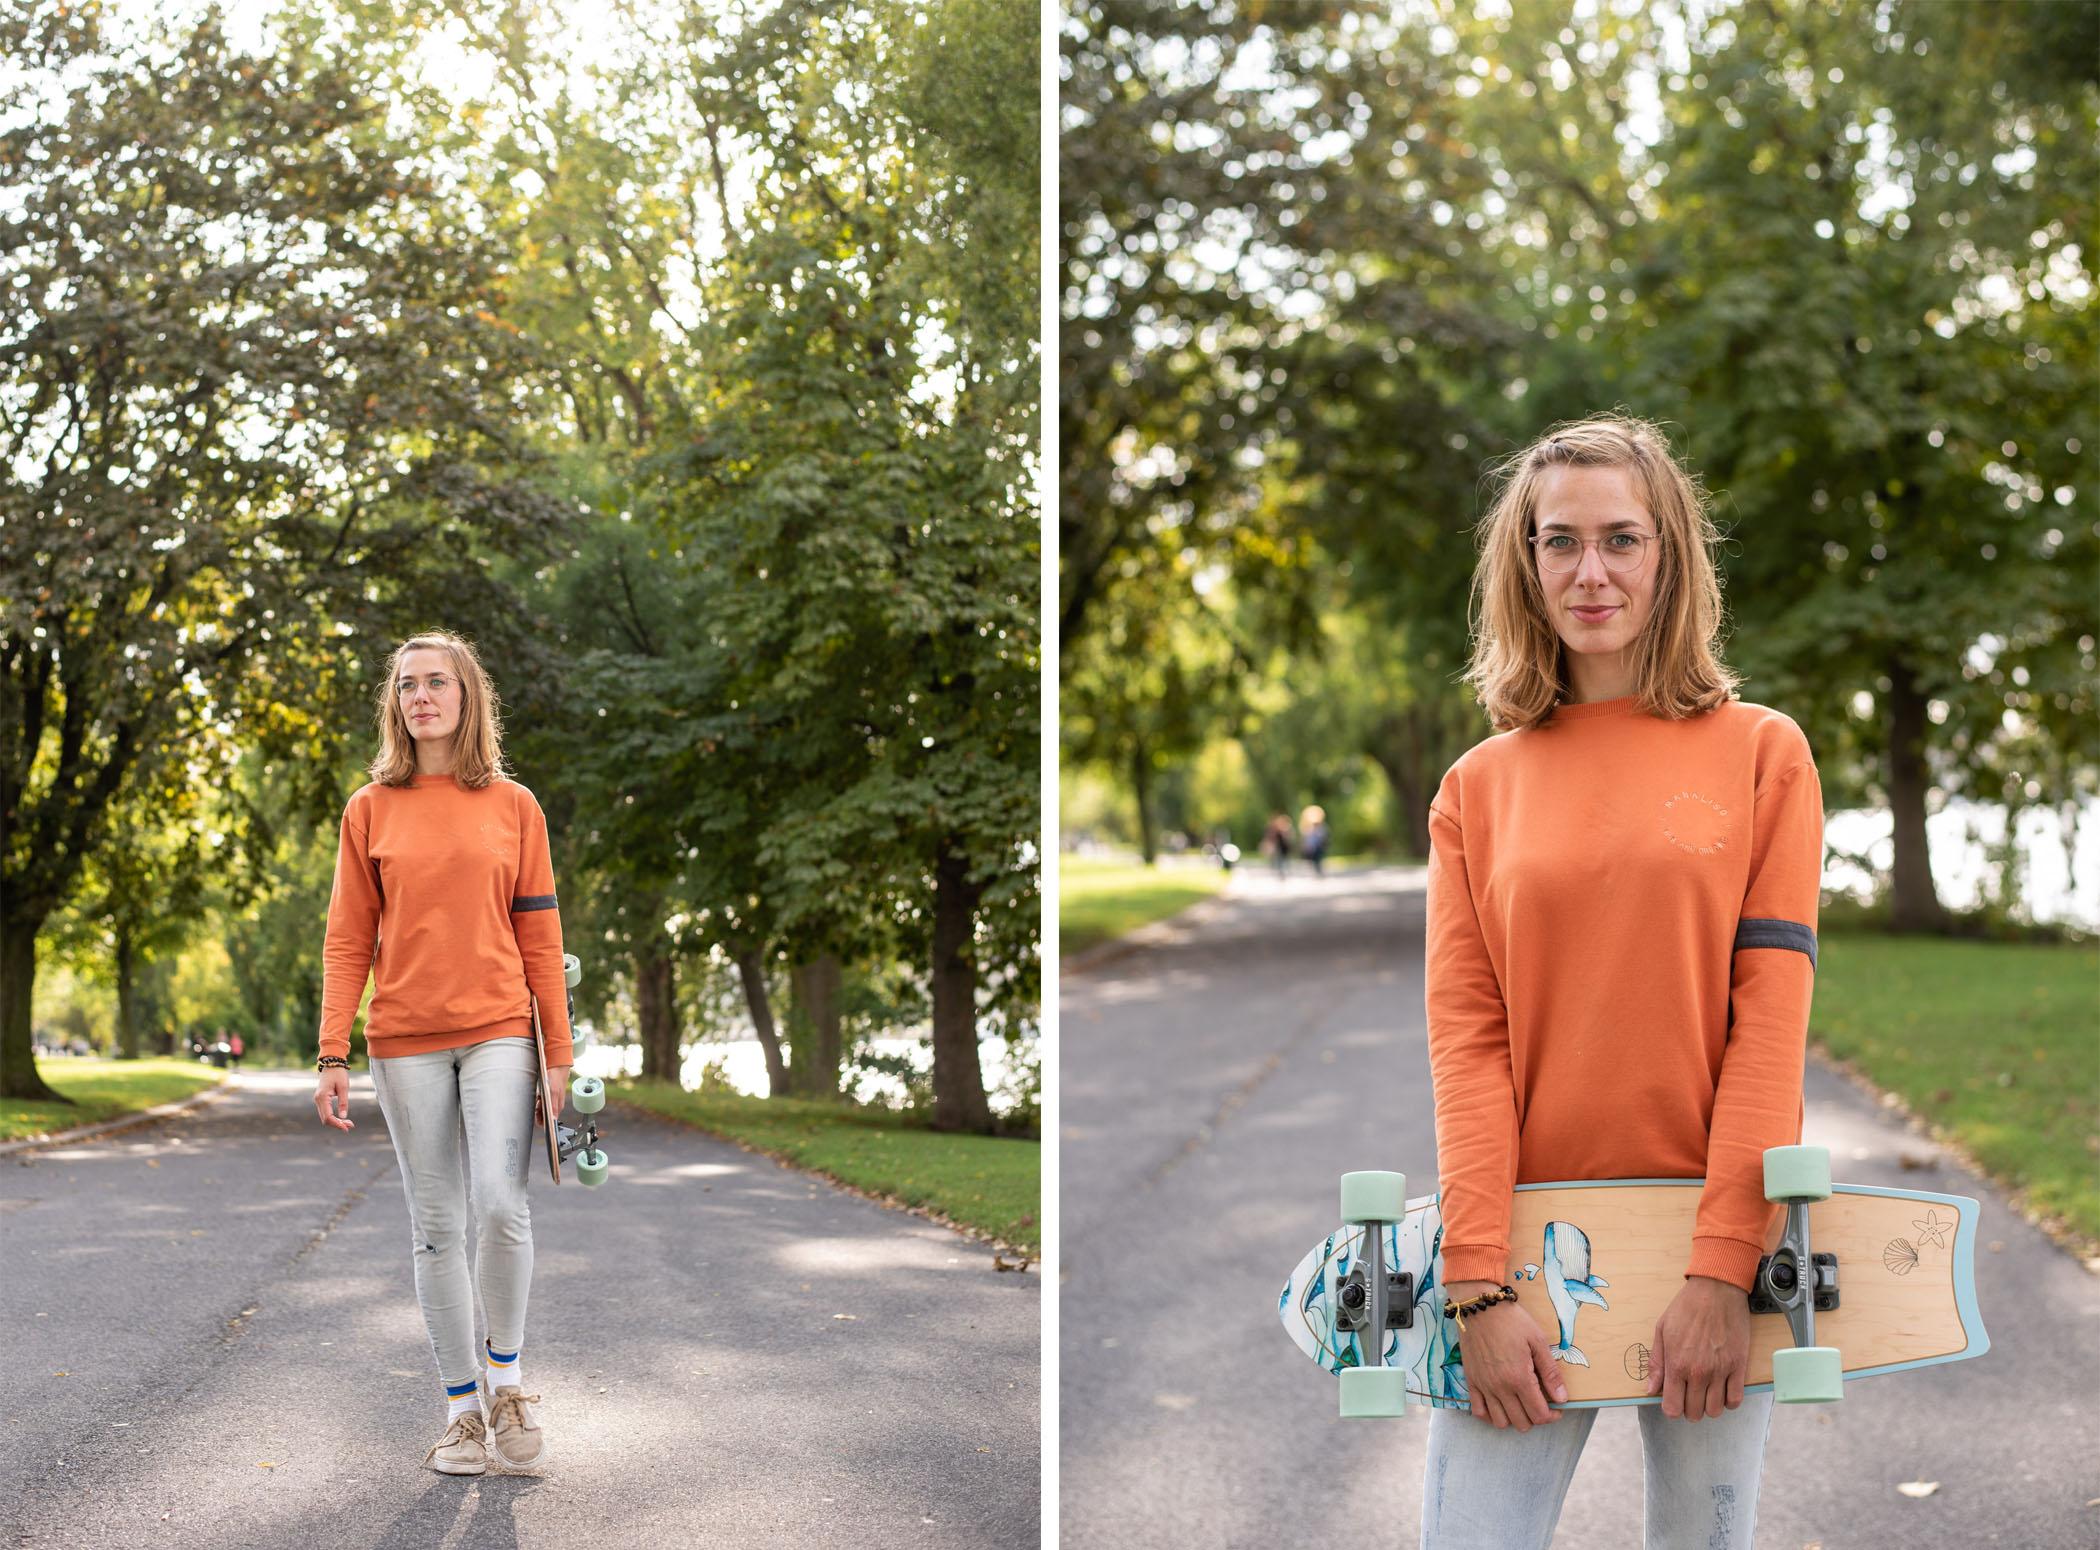 Longboard-Deborah-Keser_15